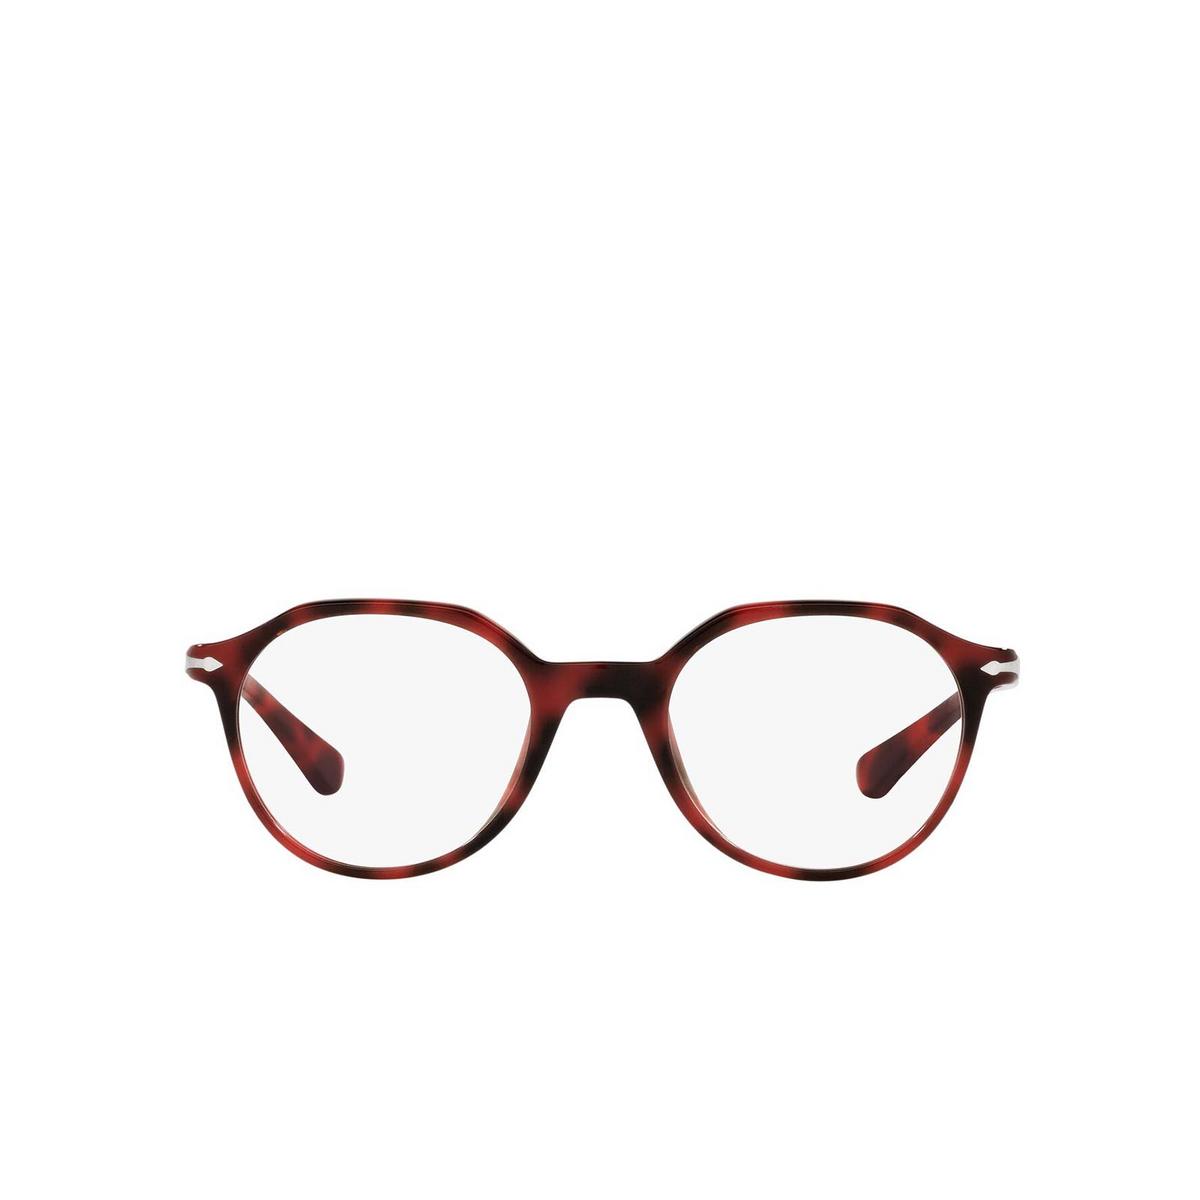 Persol® Irregular Eyeglasses: PO3253V color Red 1100 - front view.